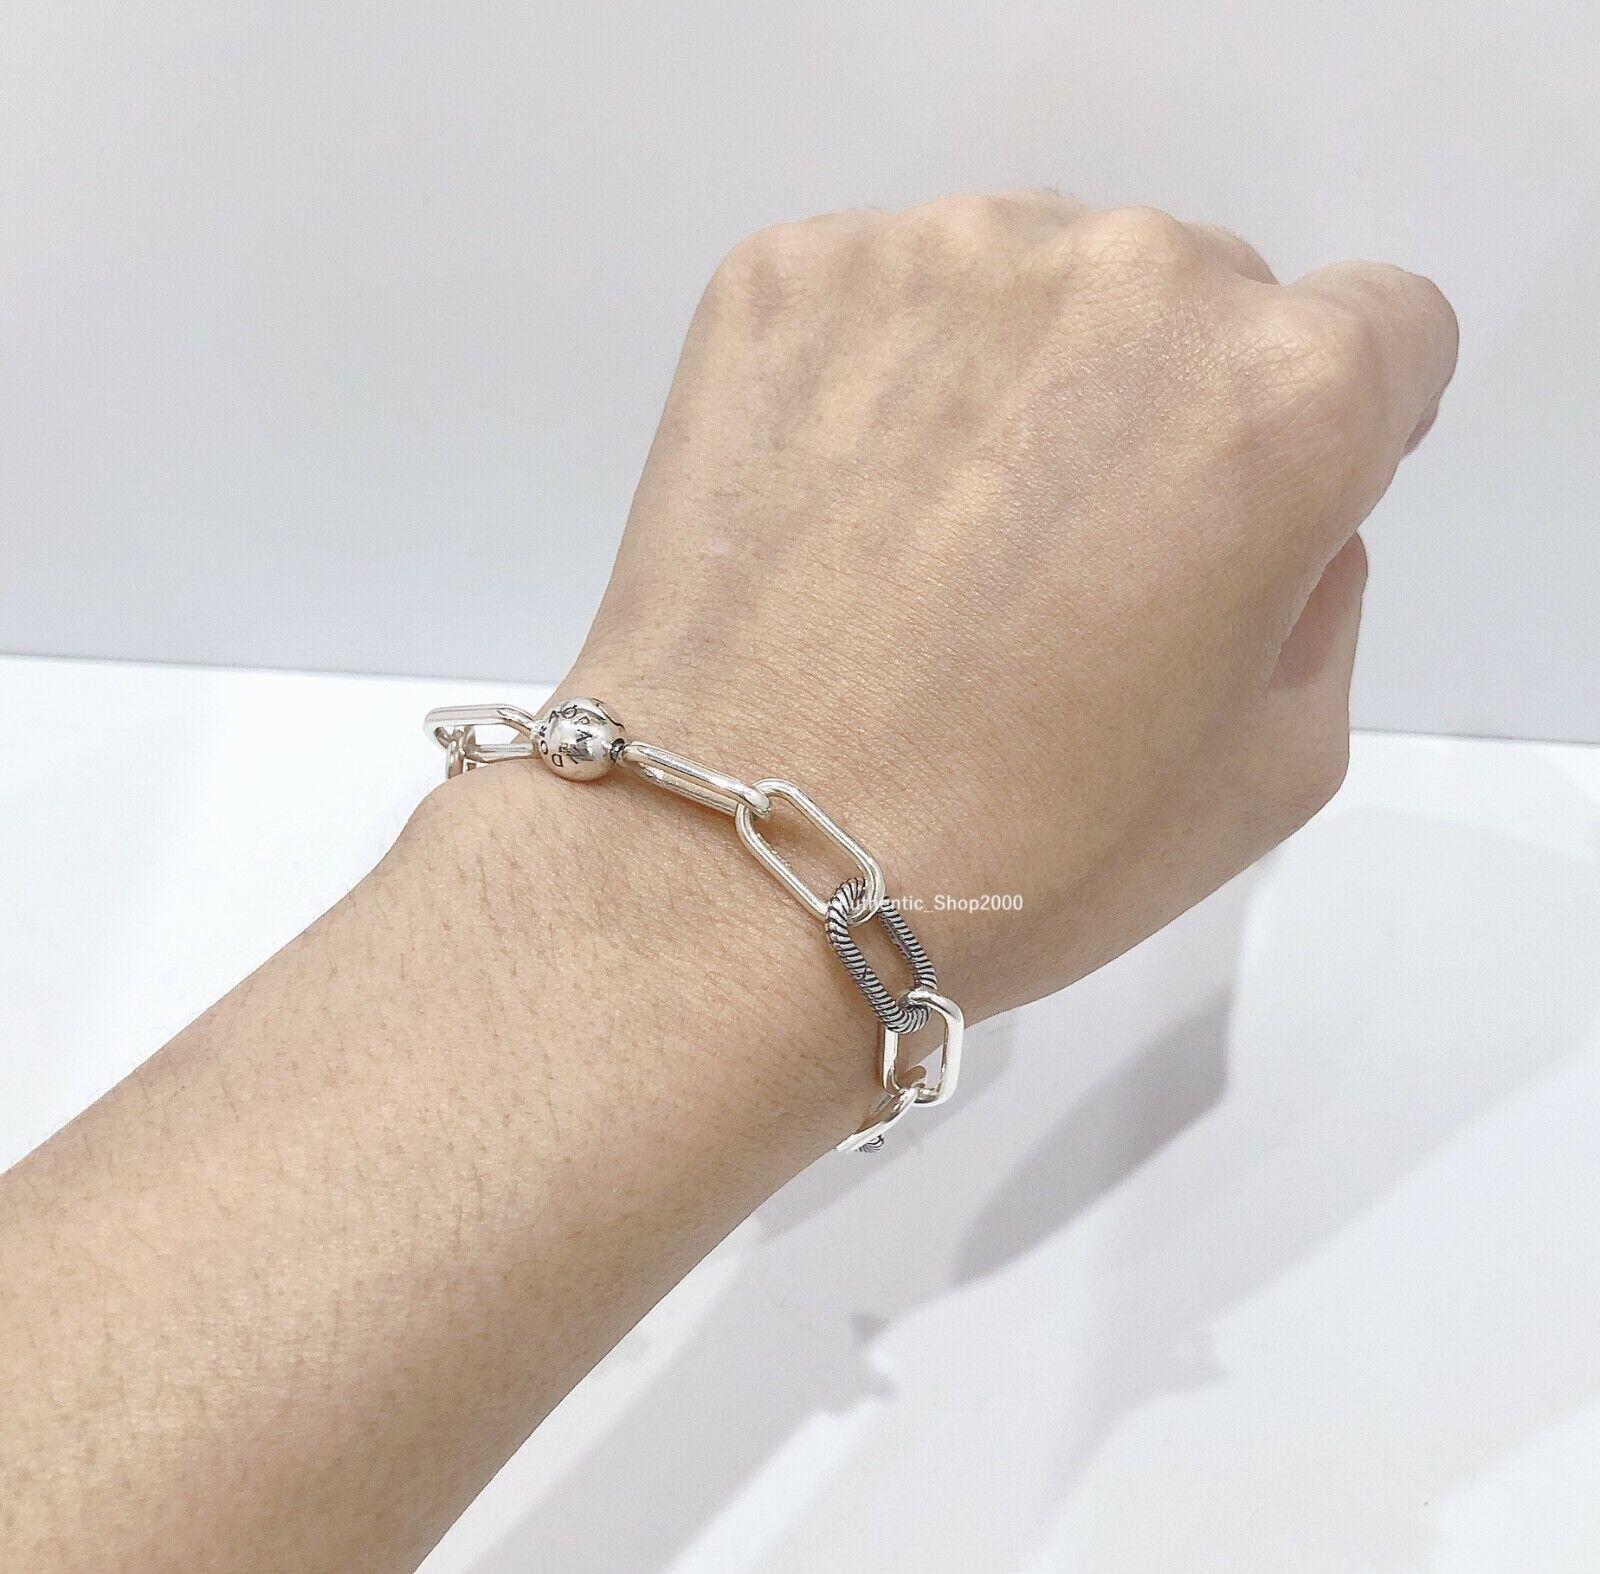 7 9 Authentic Pandora Me Link Sterling Silver Charm Bracelet 598373 4 For Sale Online Ebay